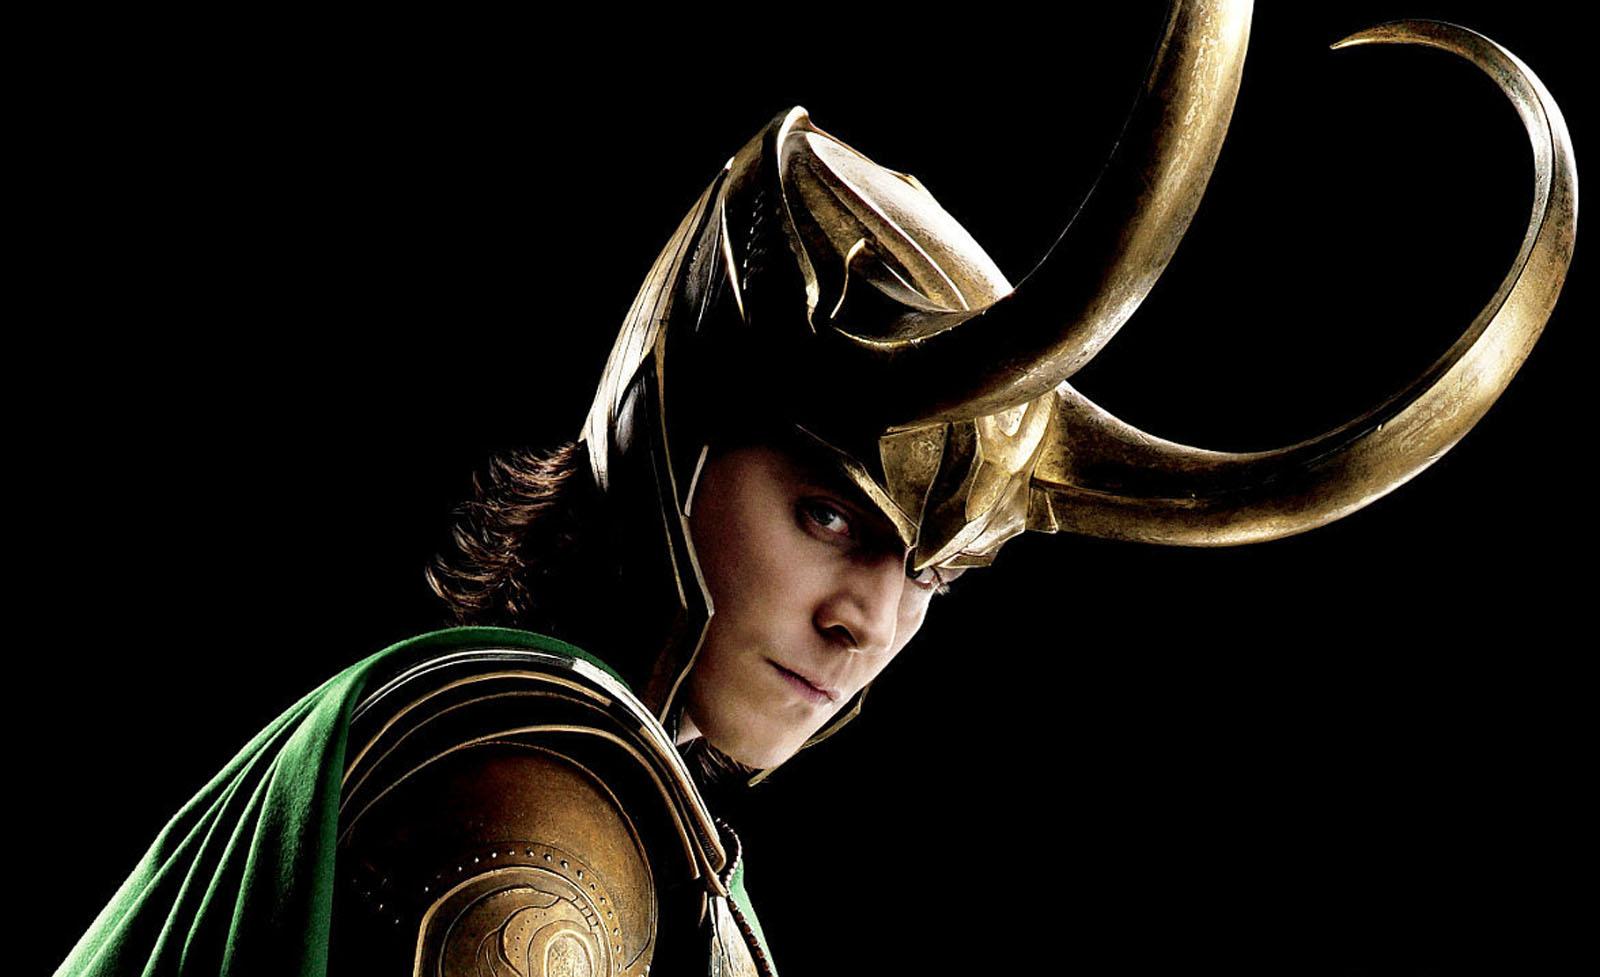 loki, tom hiddleston, thor, ragnarok, avengers